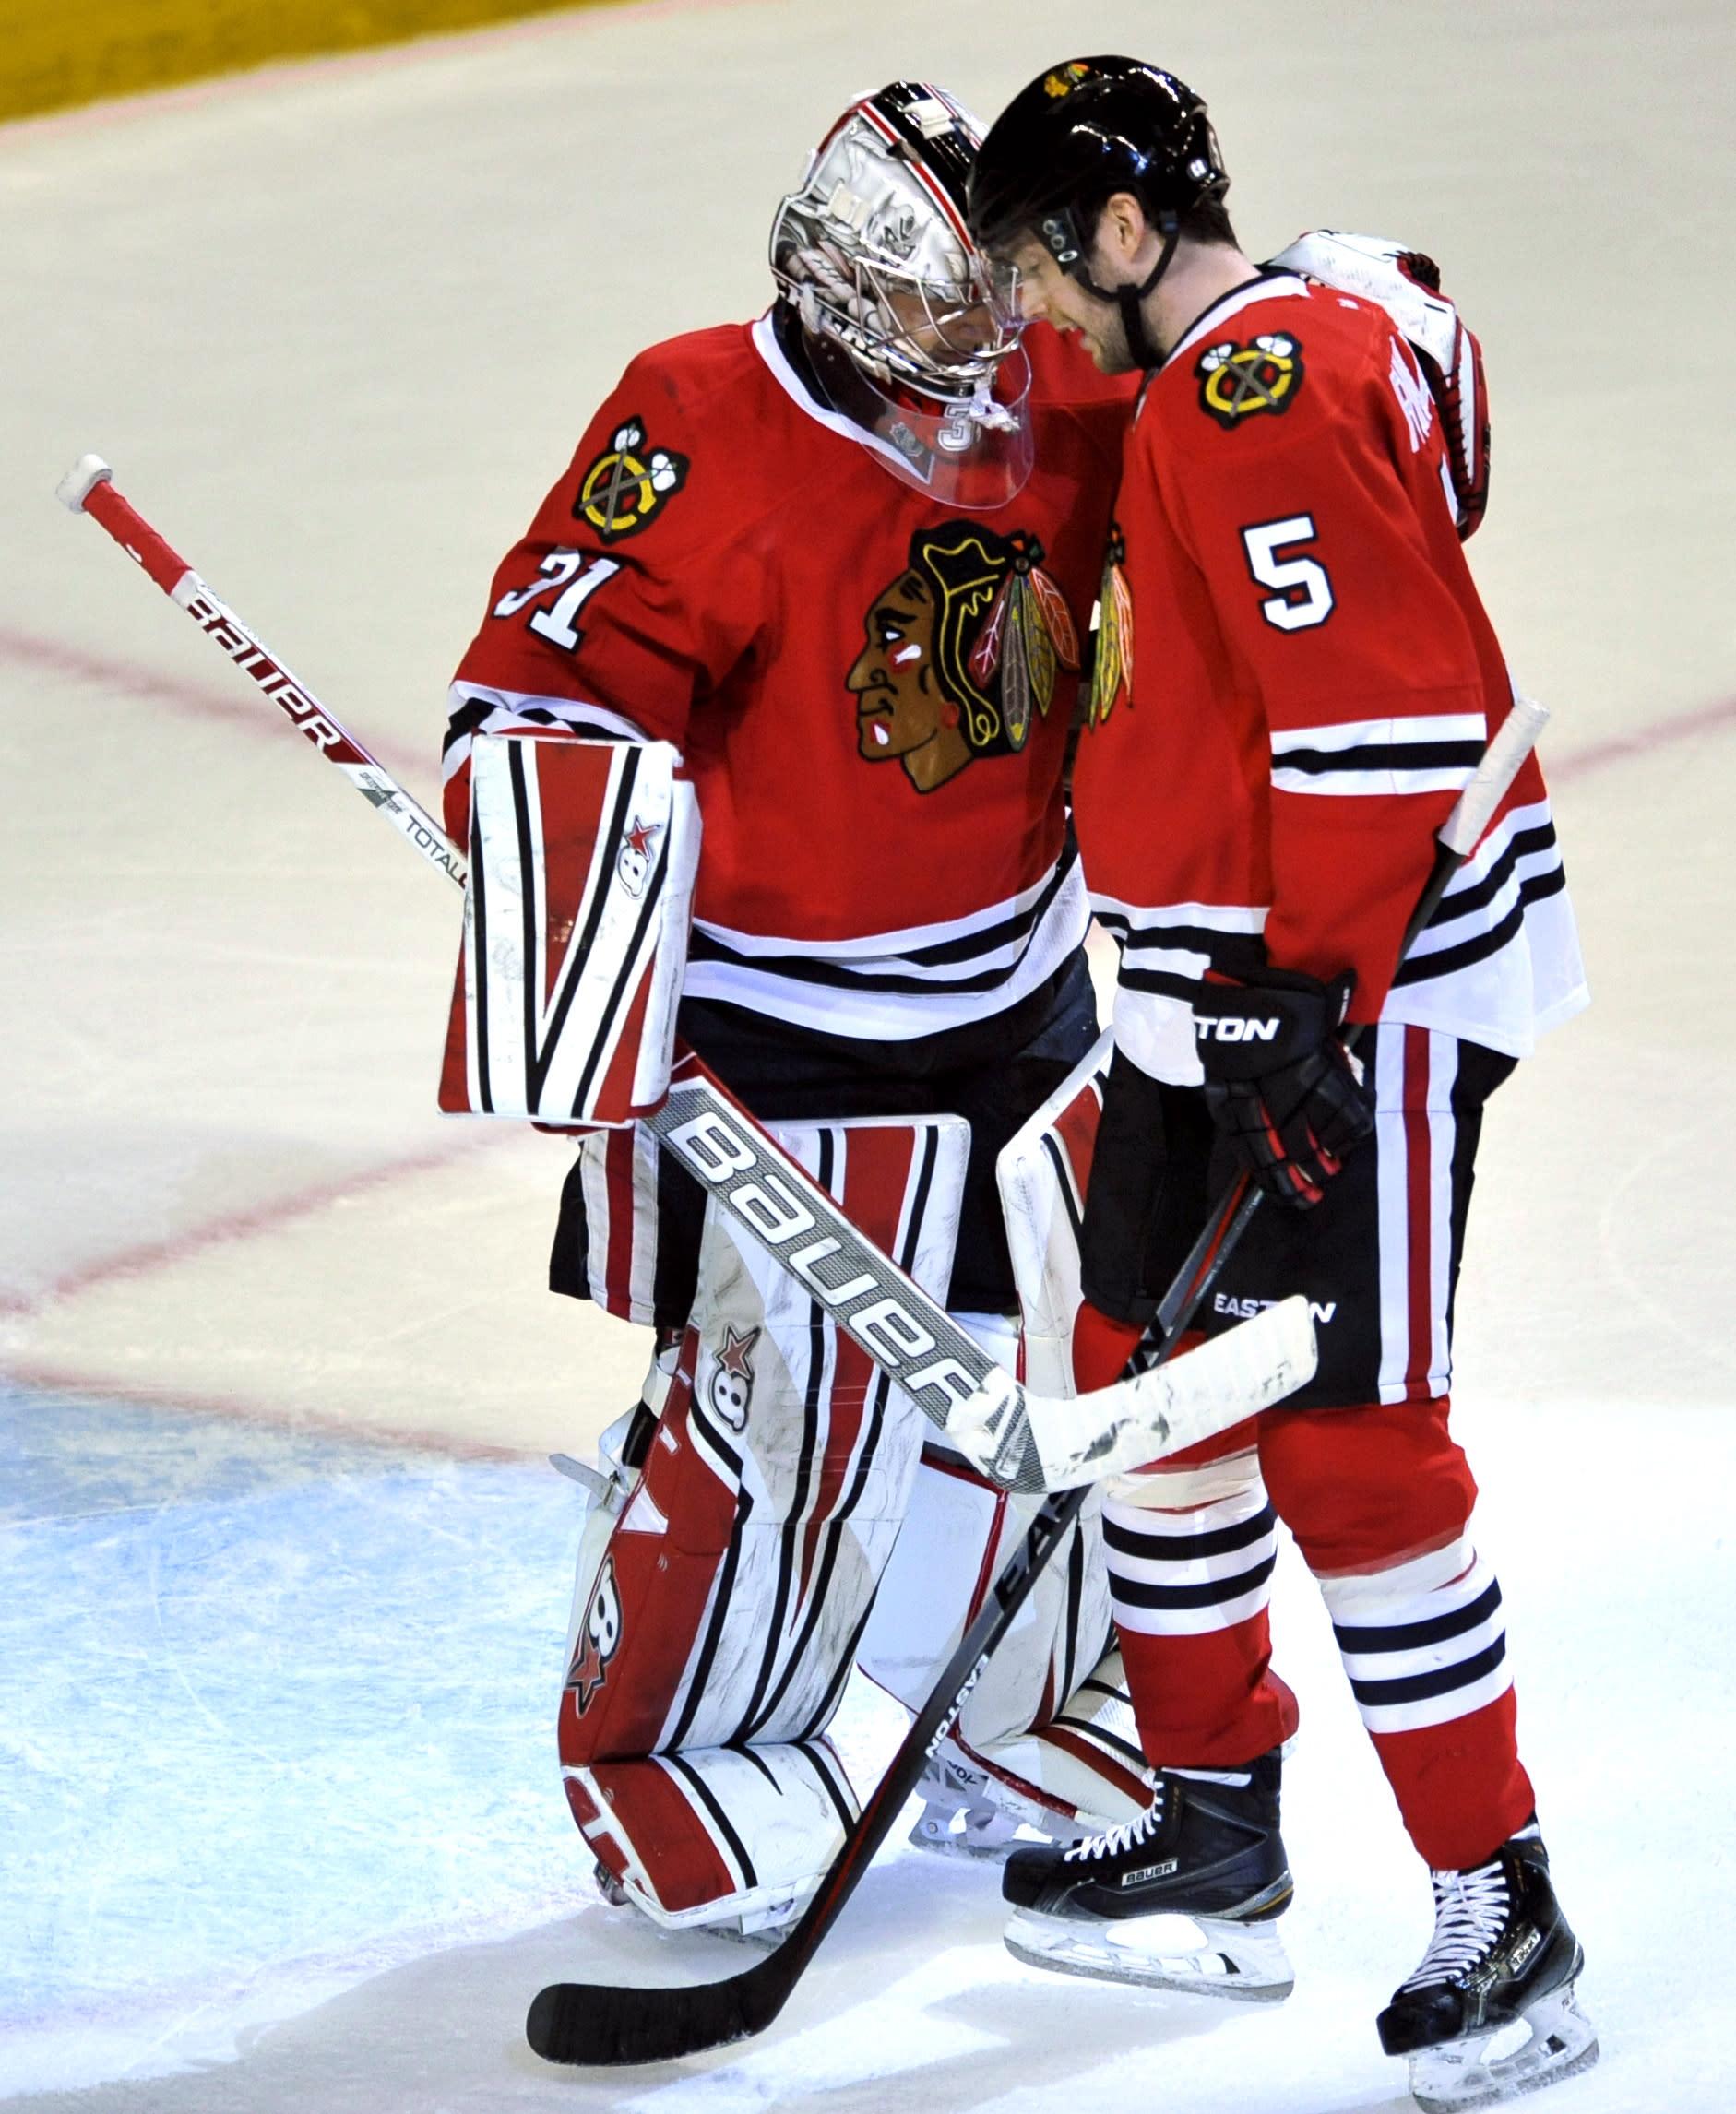 Kane leads Blackhawks past Maple Leafs 4-0